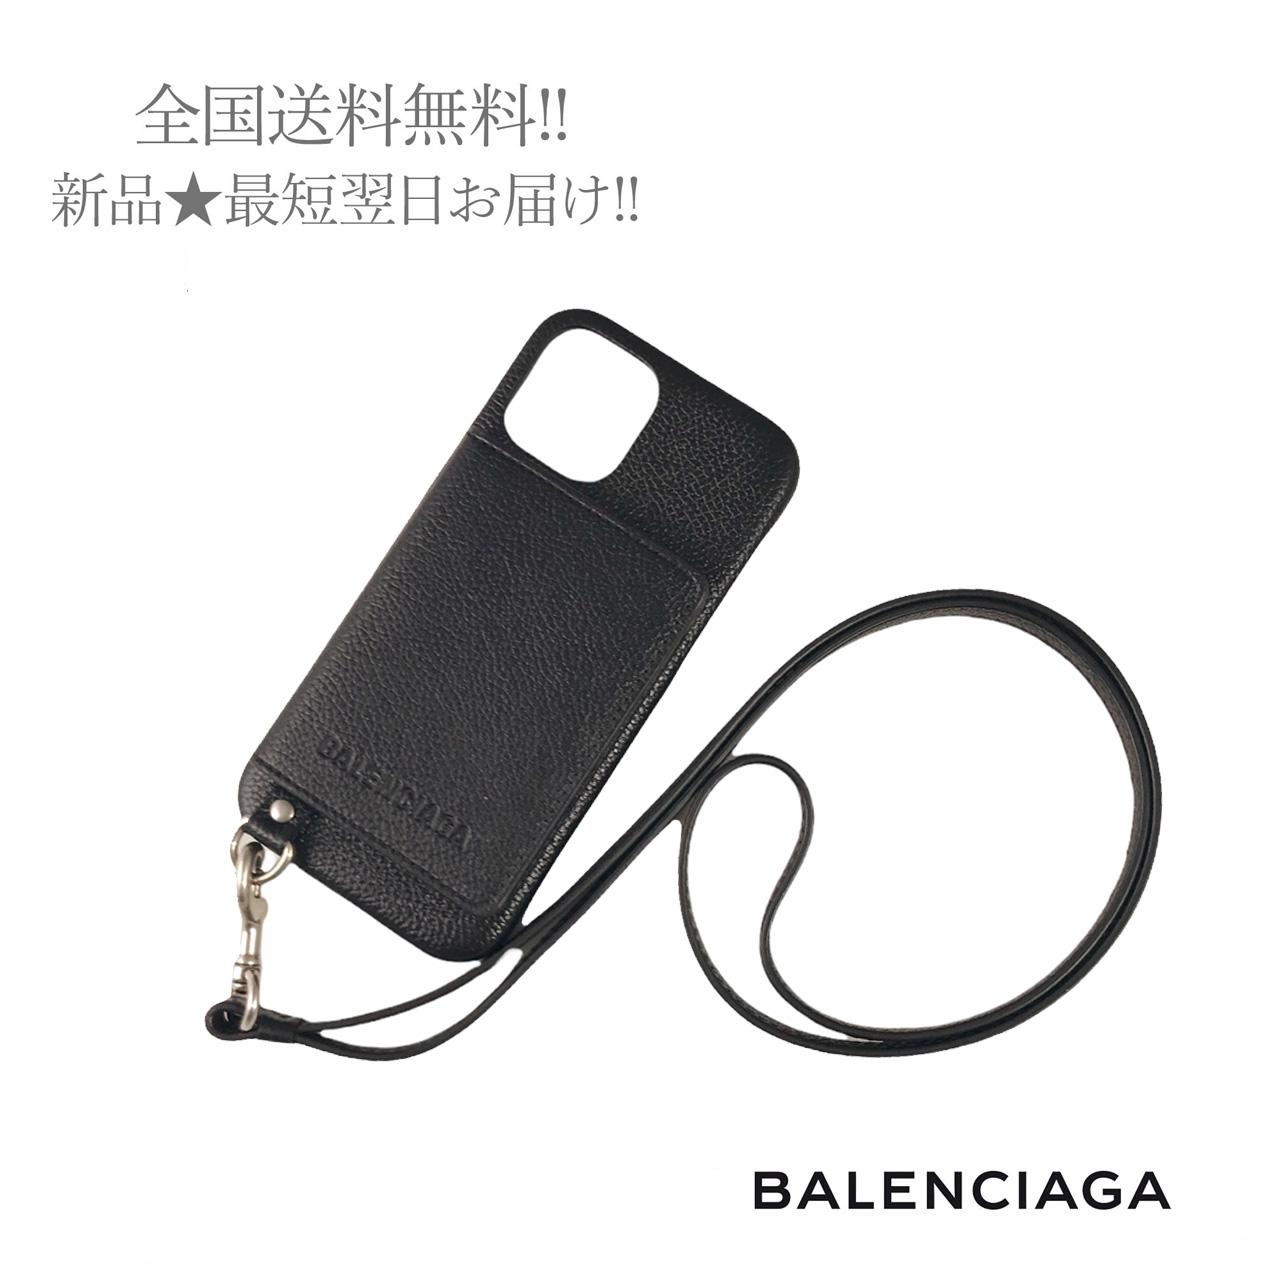 BALENCIAGA バレンシアガ iPhone 12 2020モデル ケース エンボスロゴ 限定特価 カードケース付 男 1065 メンズ 新品 ストラップ付 ブラック